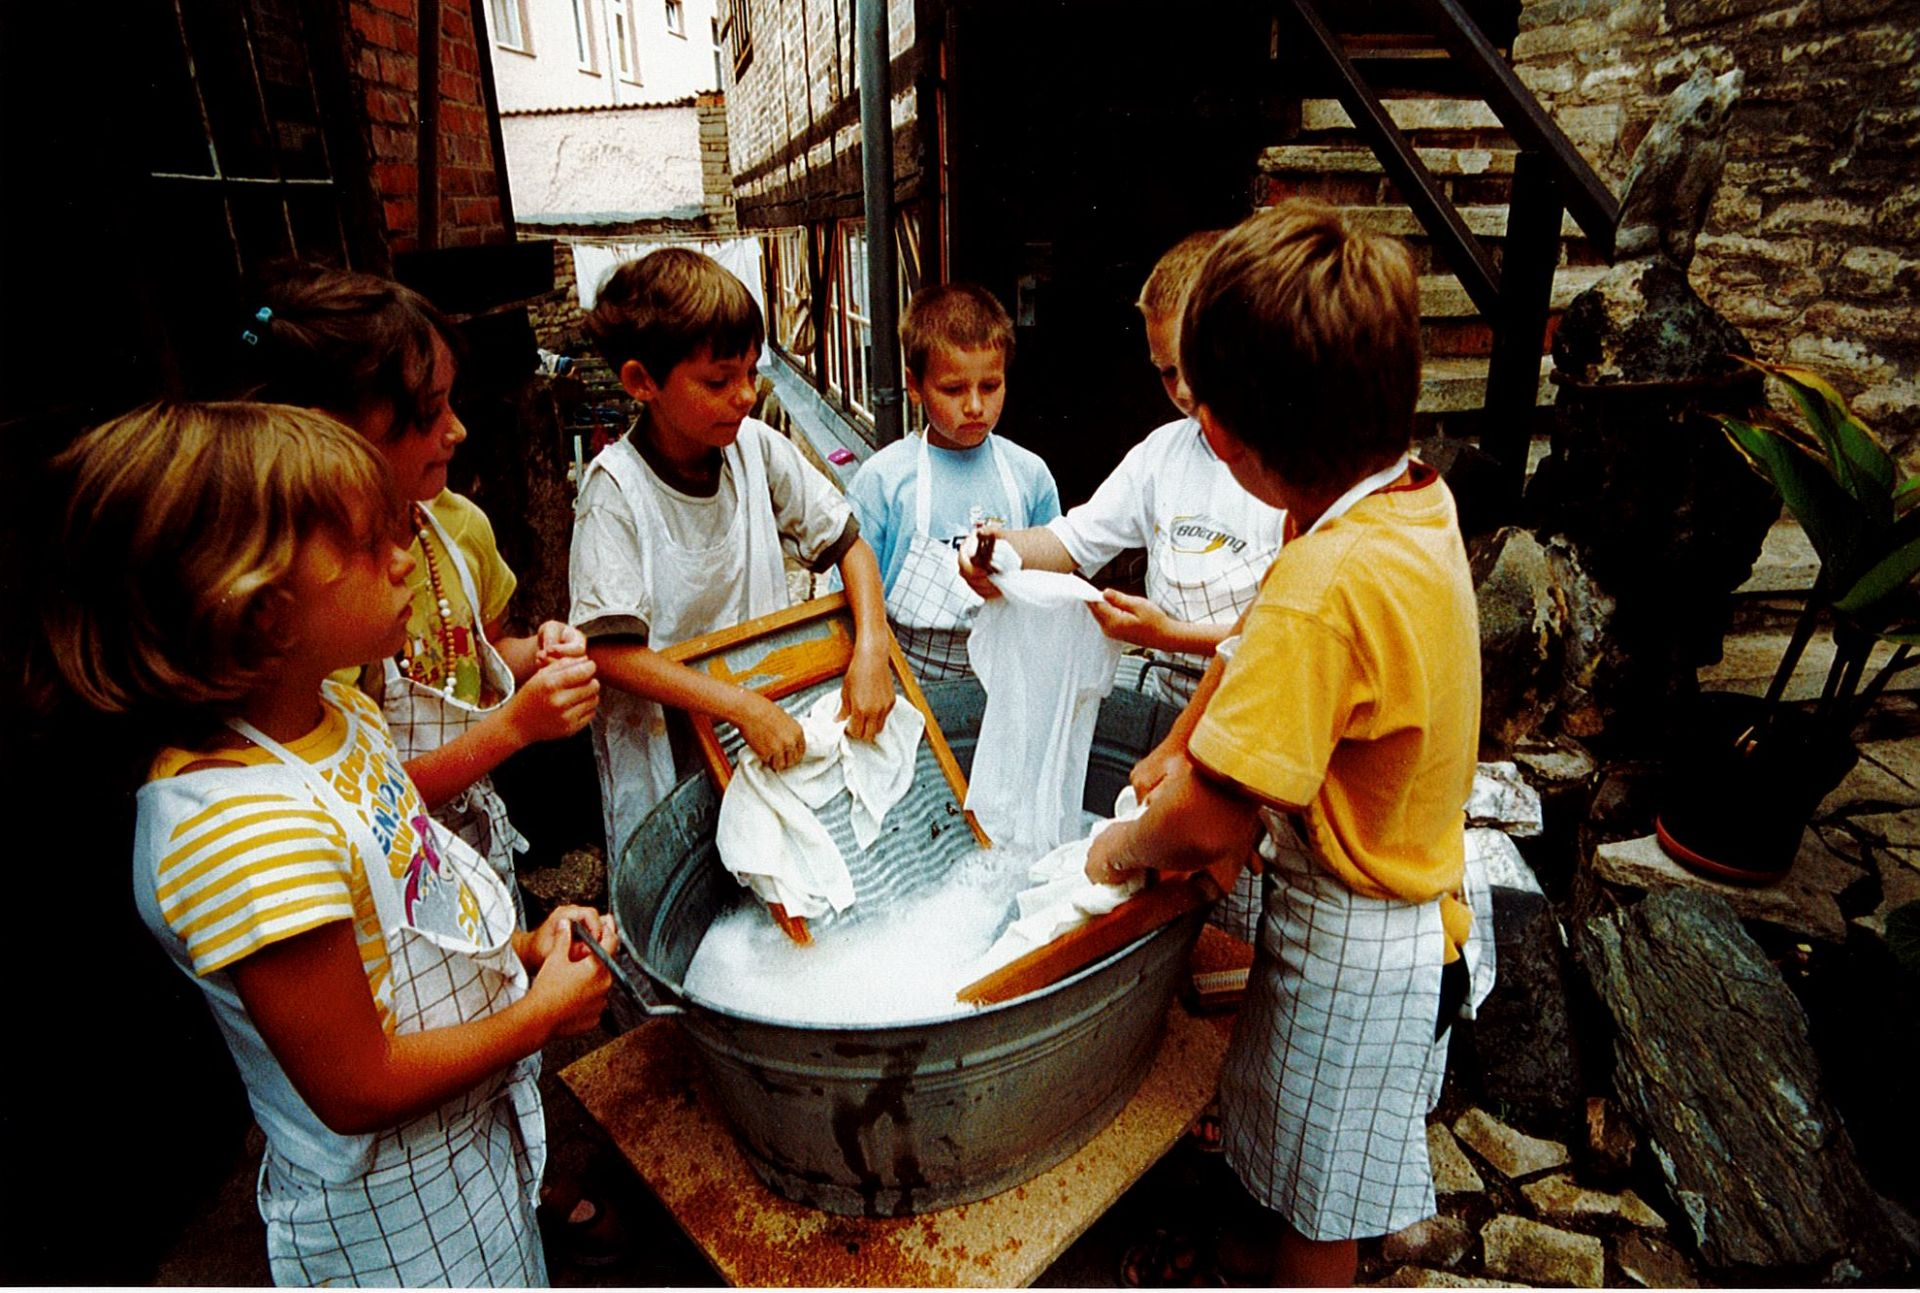 Kinderprogramm: Waschtag bei Familie Spengler